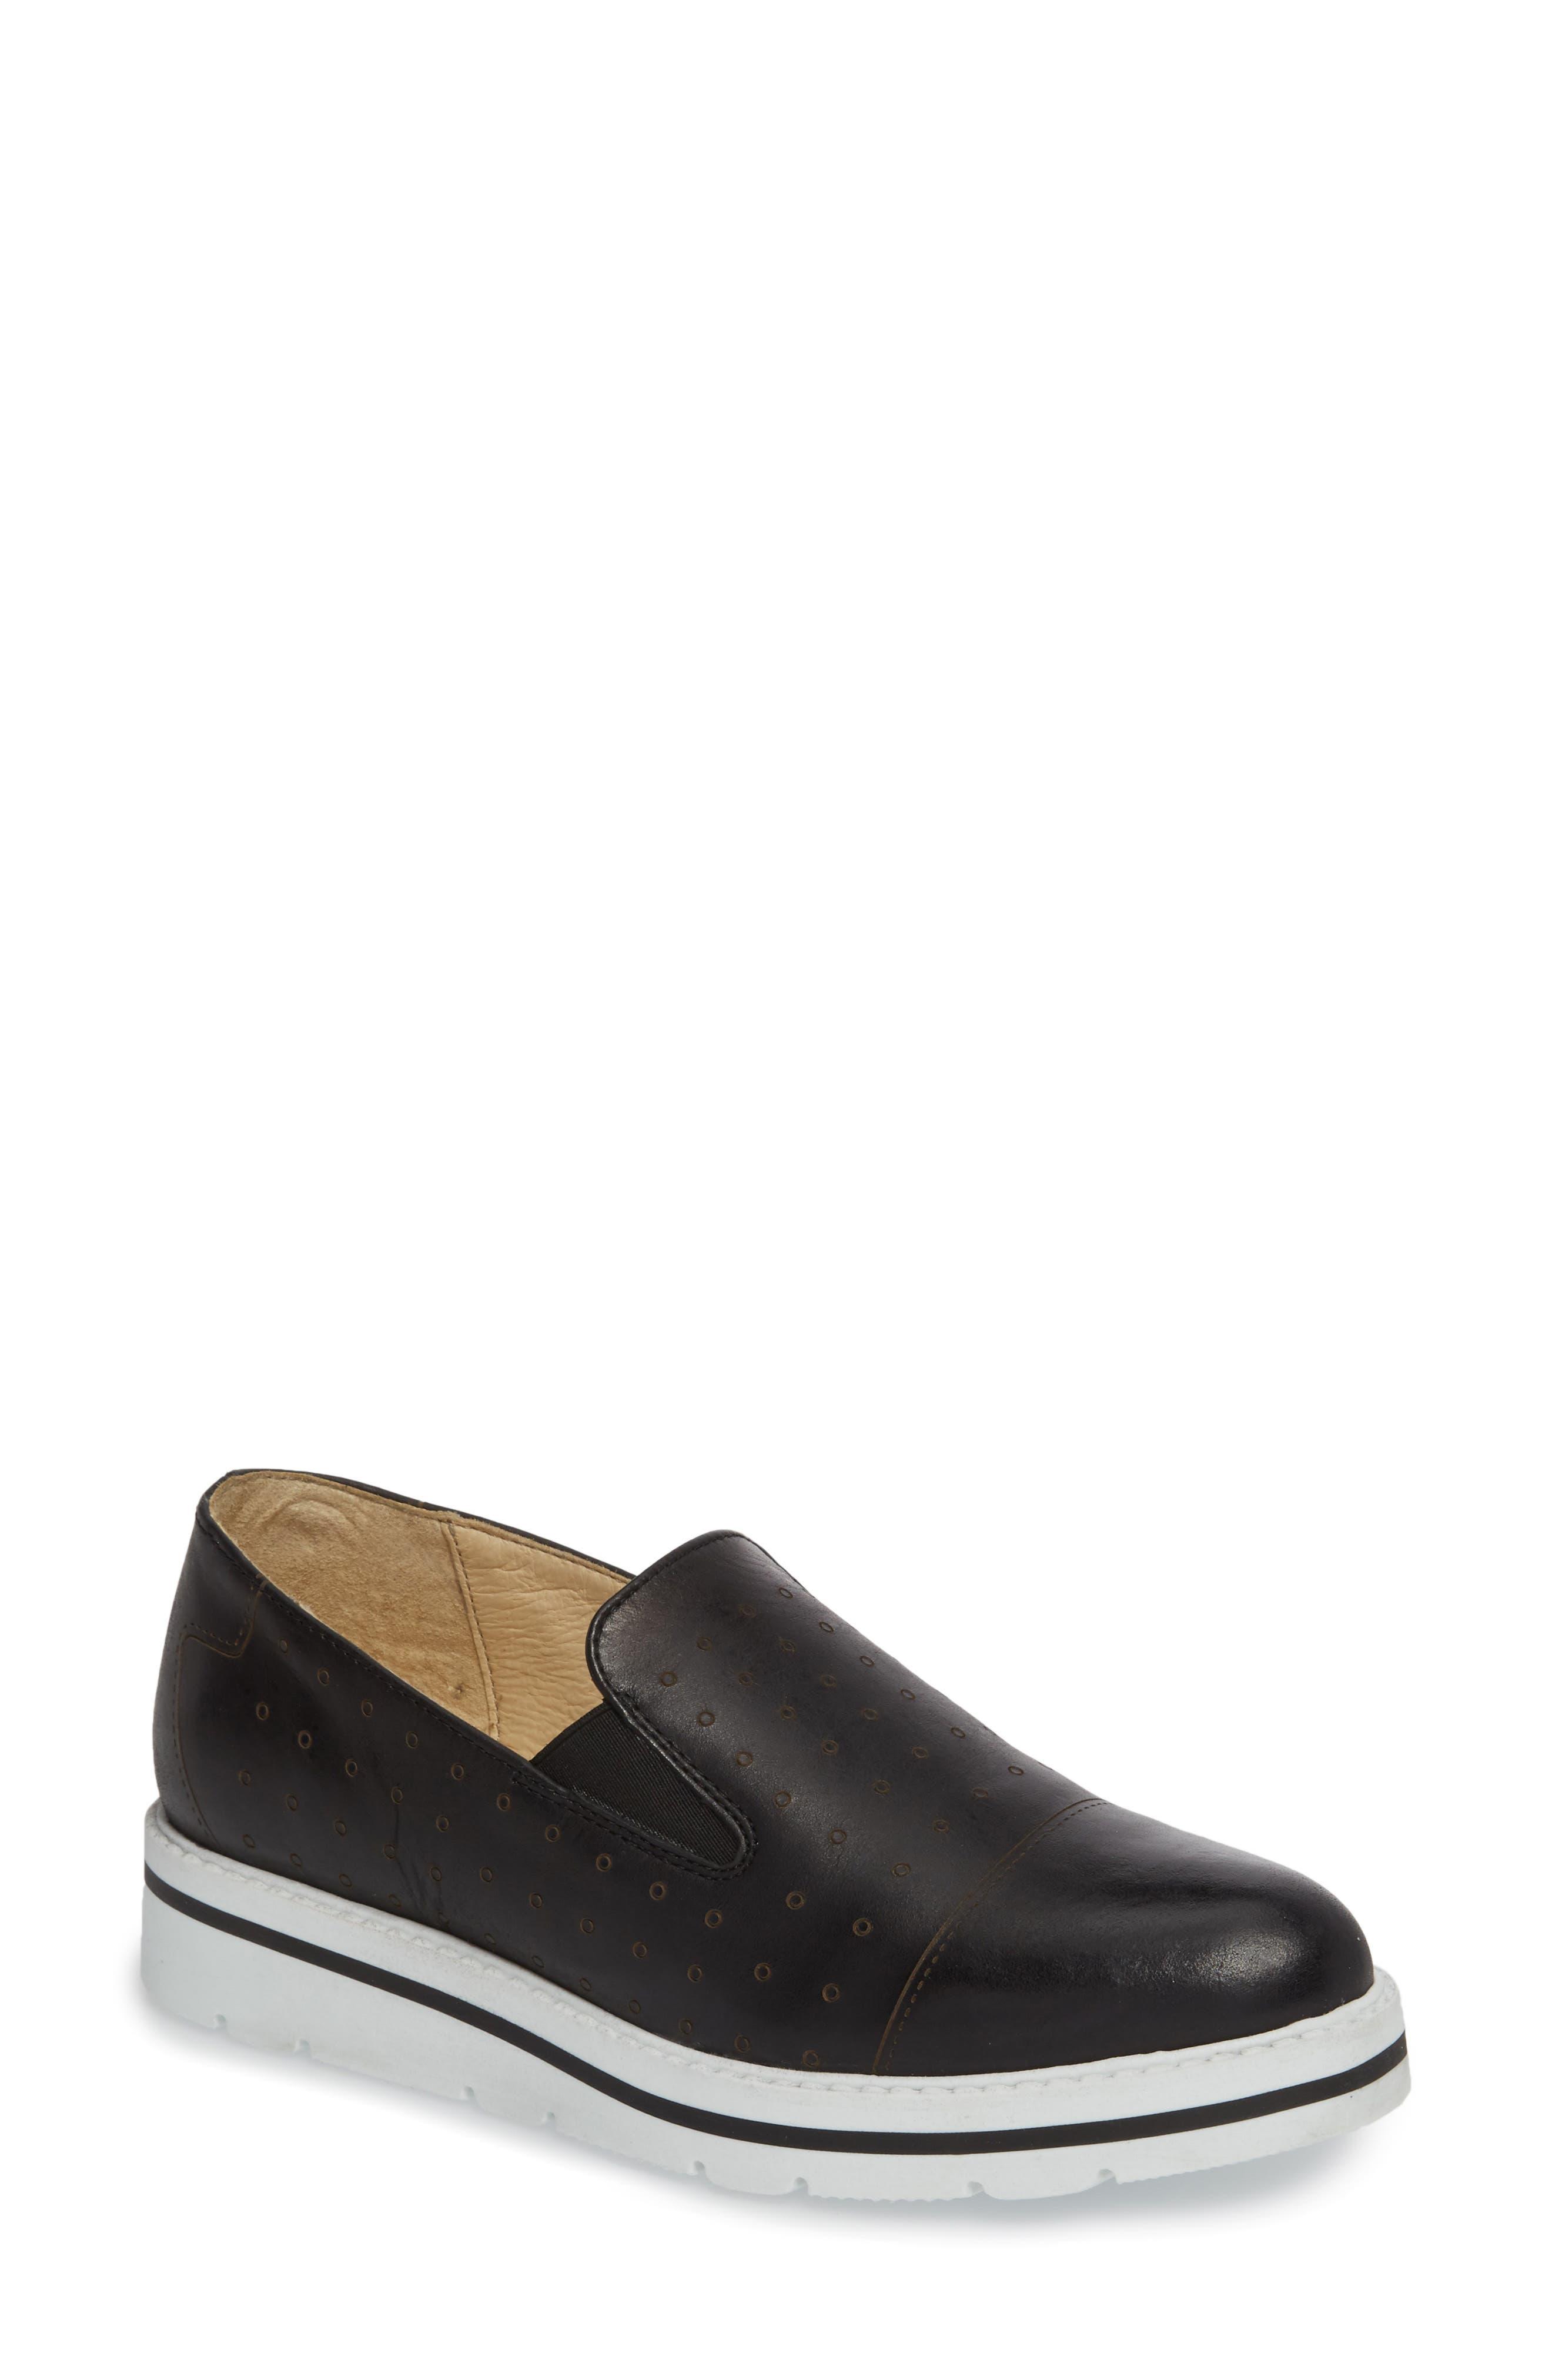 Leigh Slip-On Sneaker,                             Main thumbnail 1, color,                             BLACK GLAMOUR LEATHER